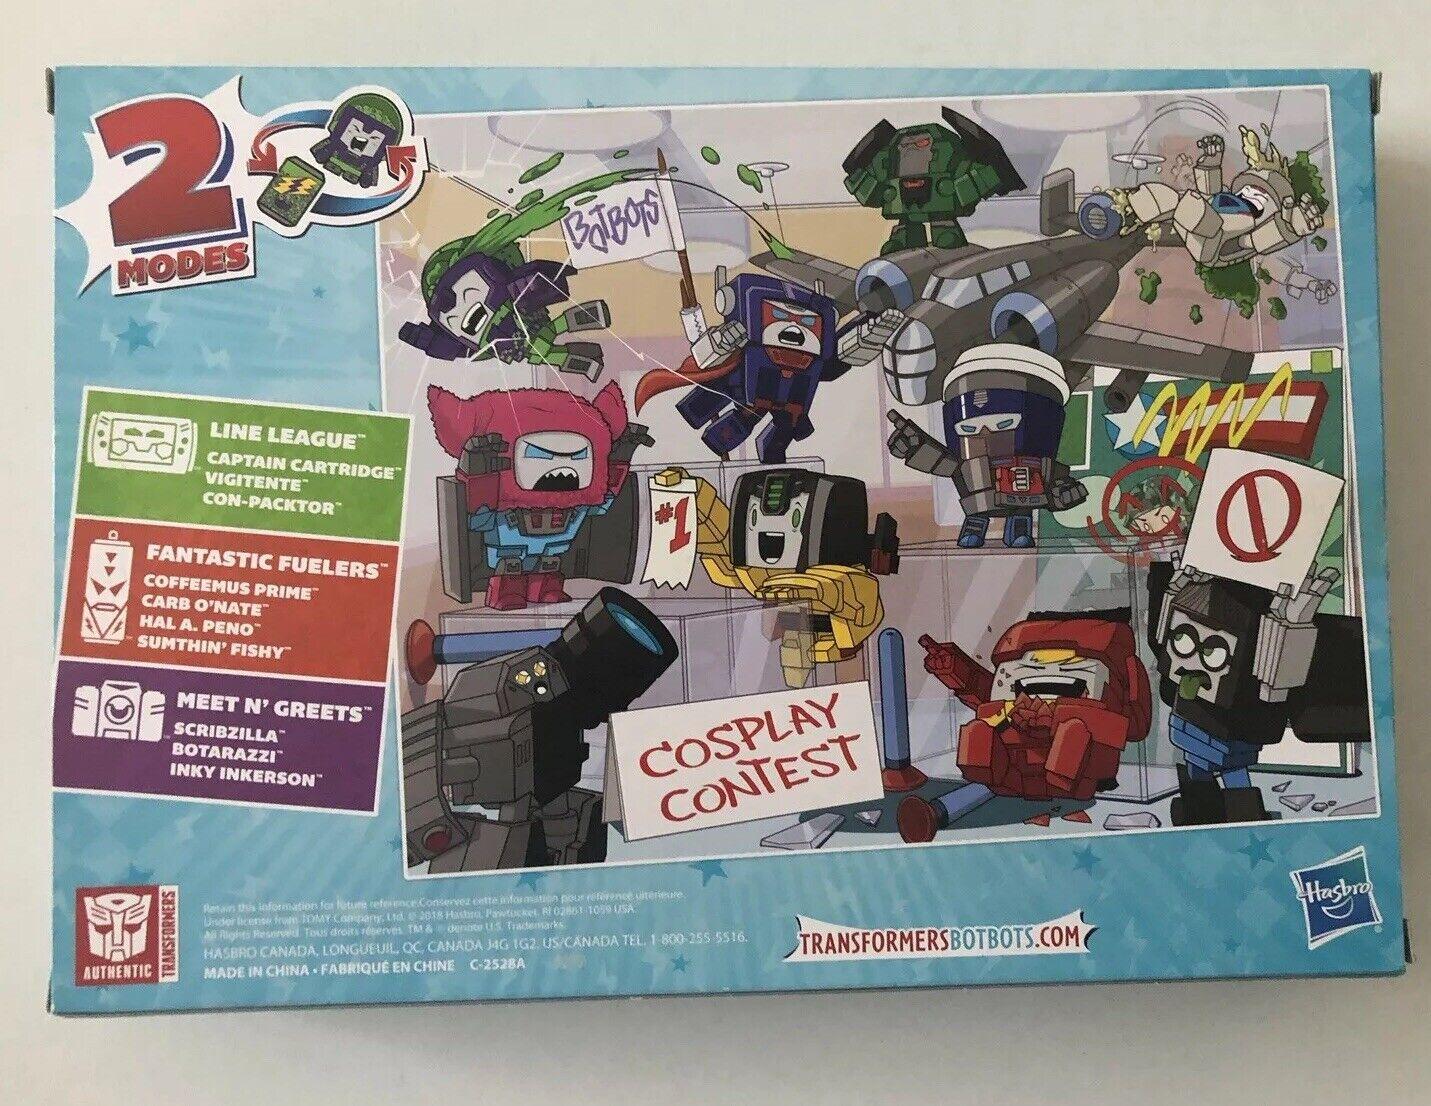 San  Diego comic-con 2019 Hasbro Transformers Blaster vs Soundwave omnibots Trading voitured Game Ready to ship  sortie en ligne